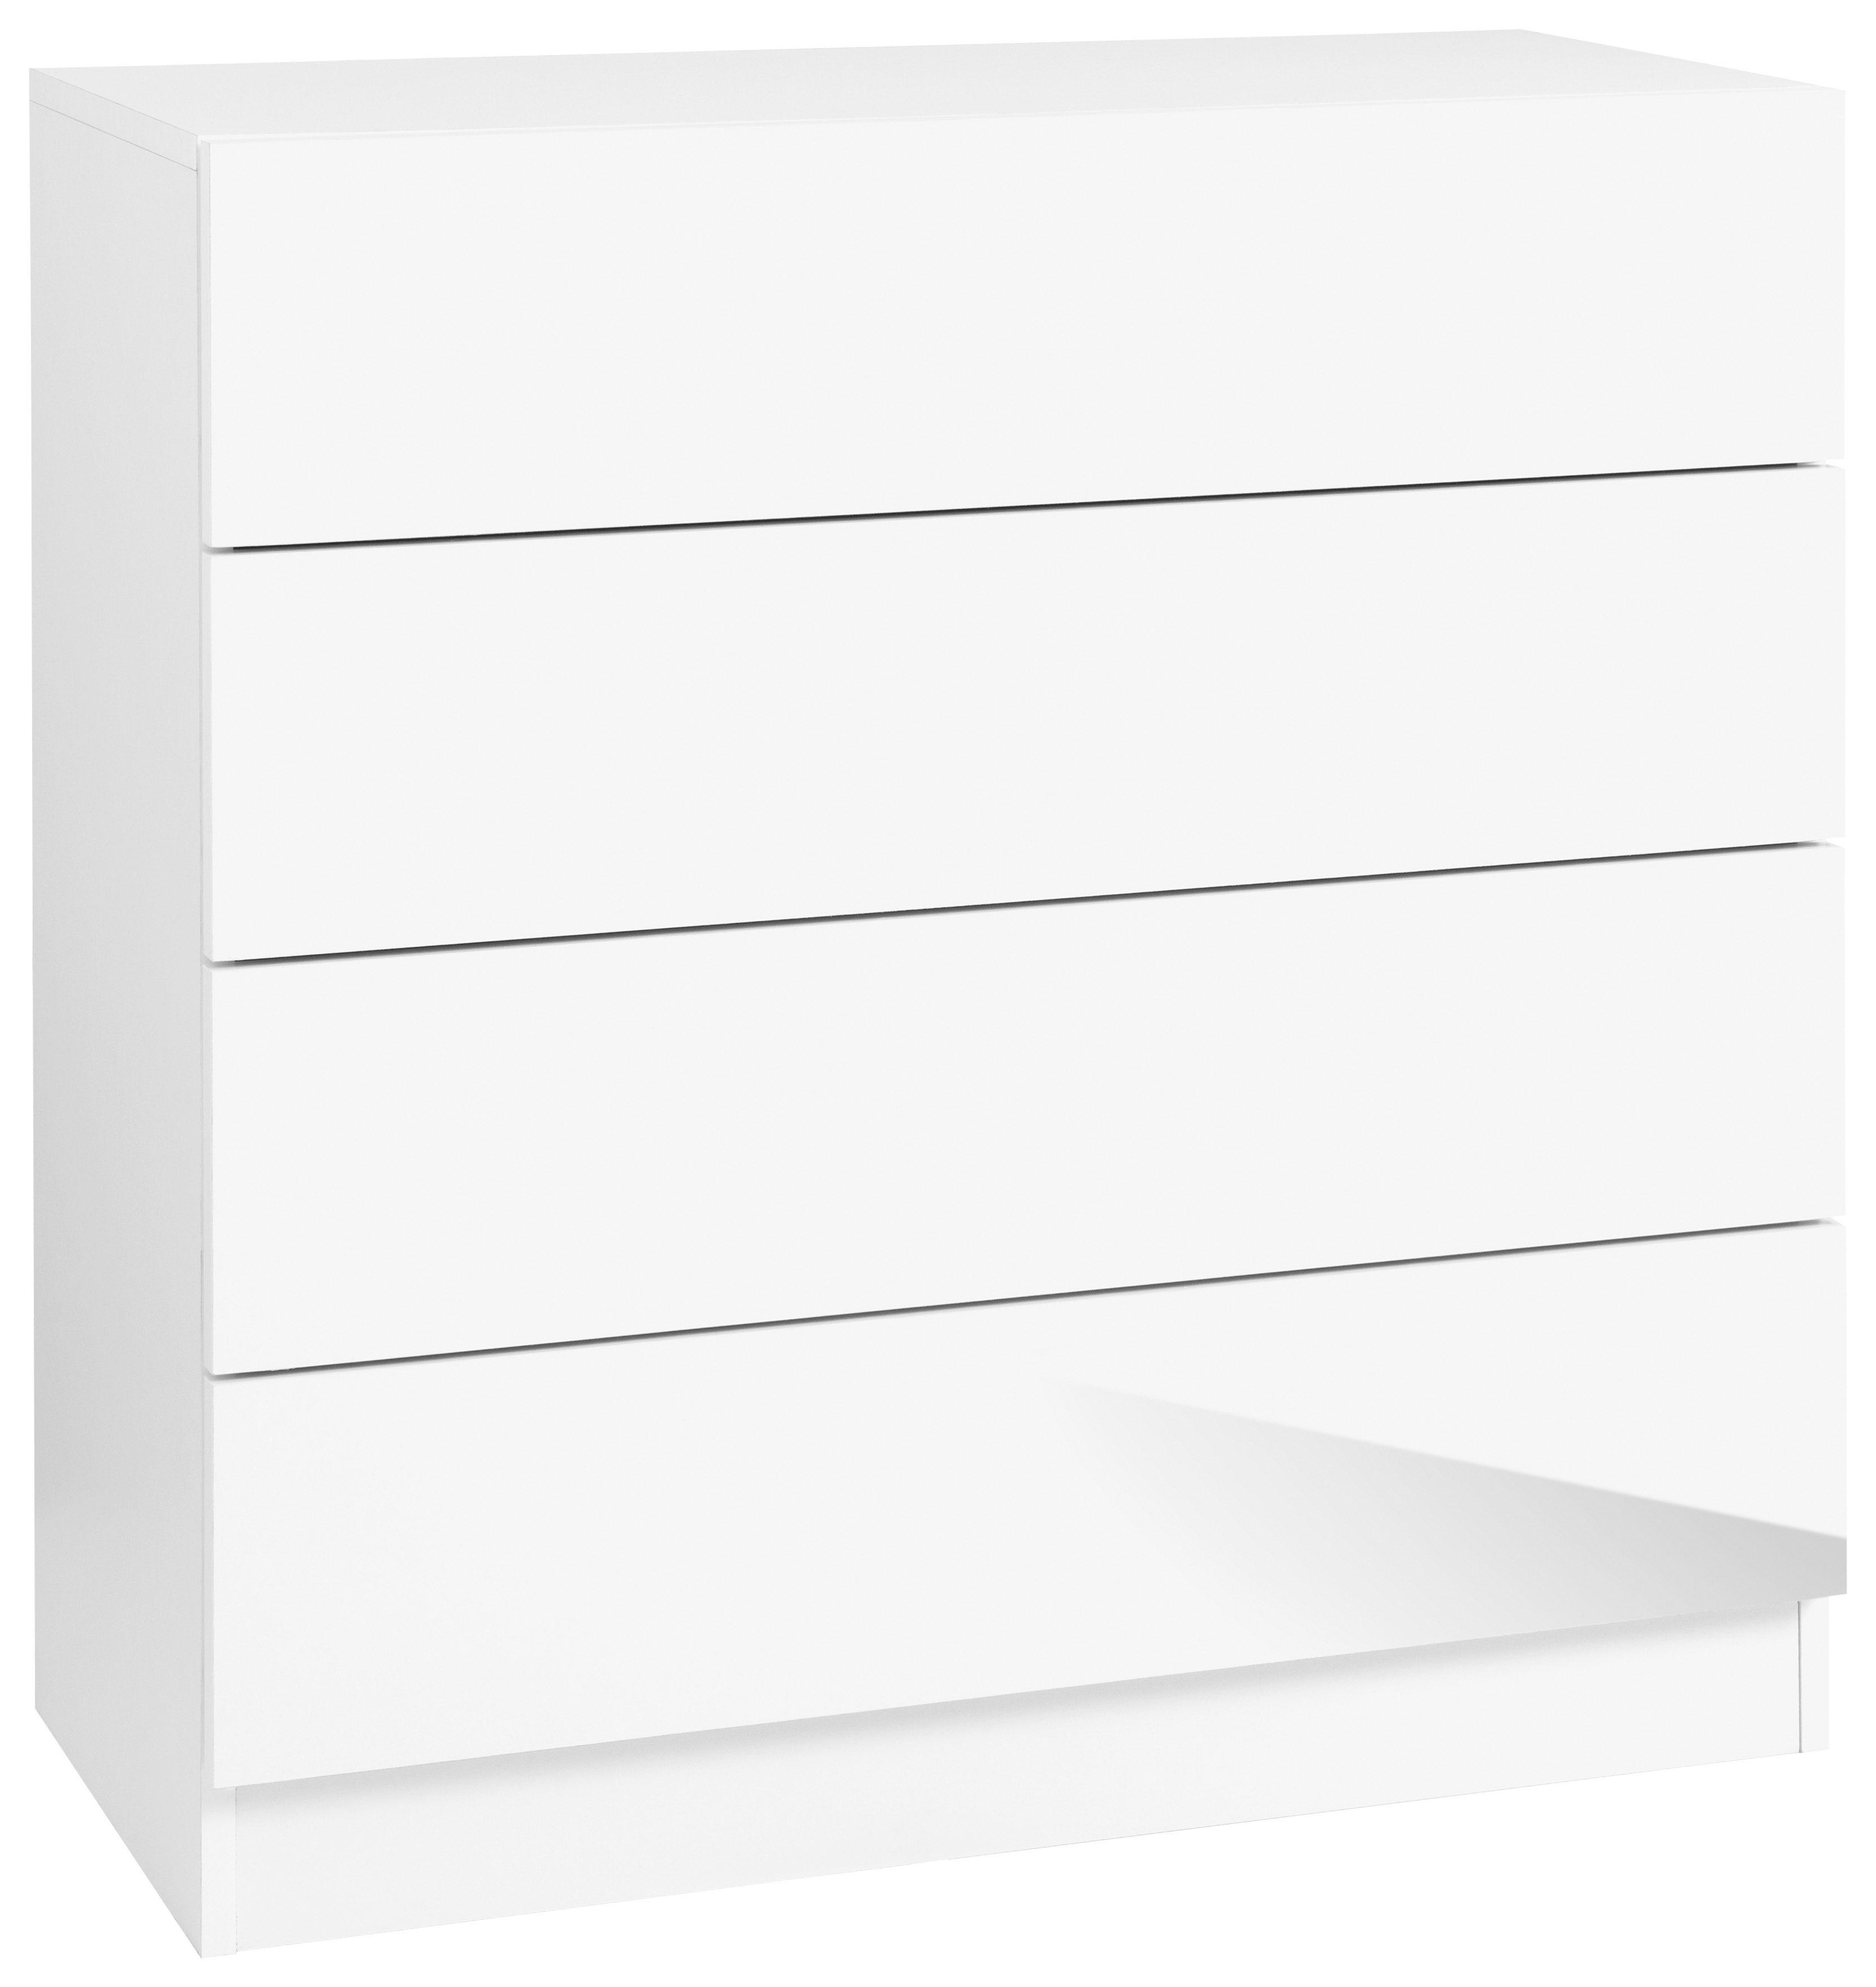 Borchardt Möbel Kommode Vaasa Breite 76 cm mit Push To Open-Funktion